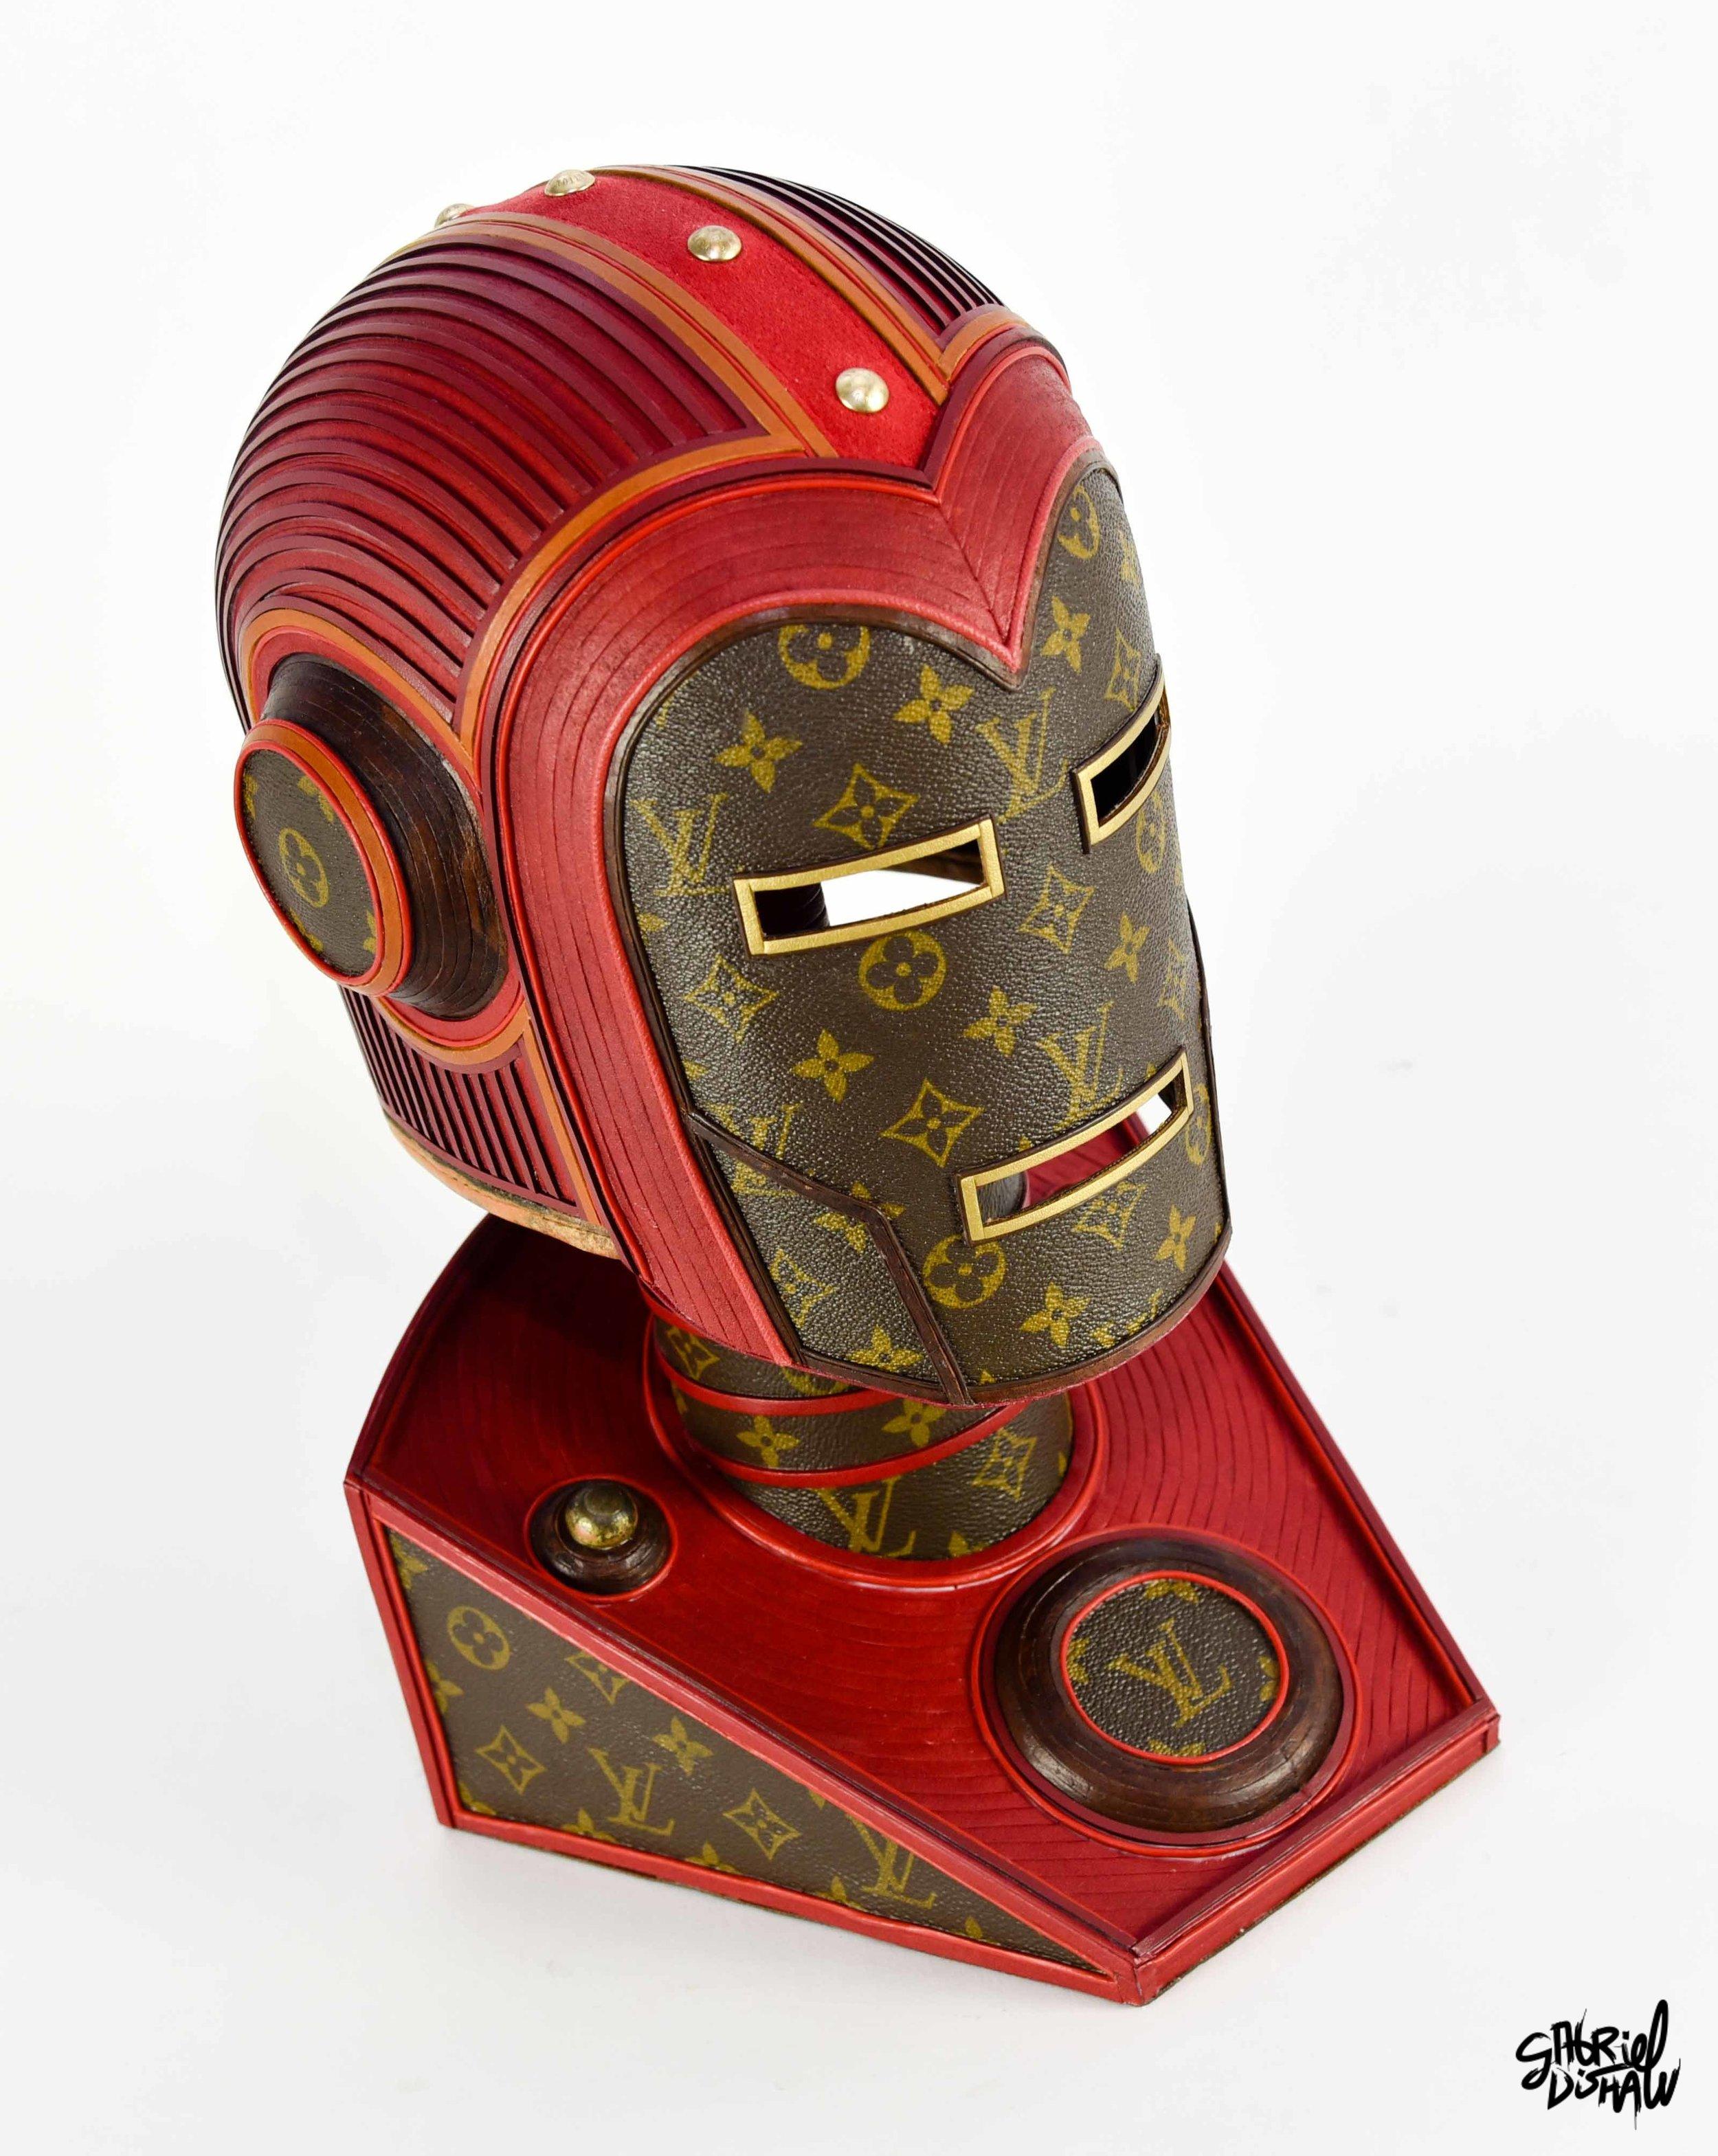 Gabriel Dishaw Vintage Iron Man LV-9963.jpg